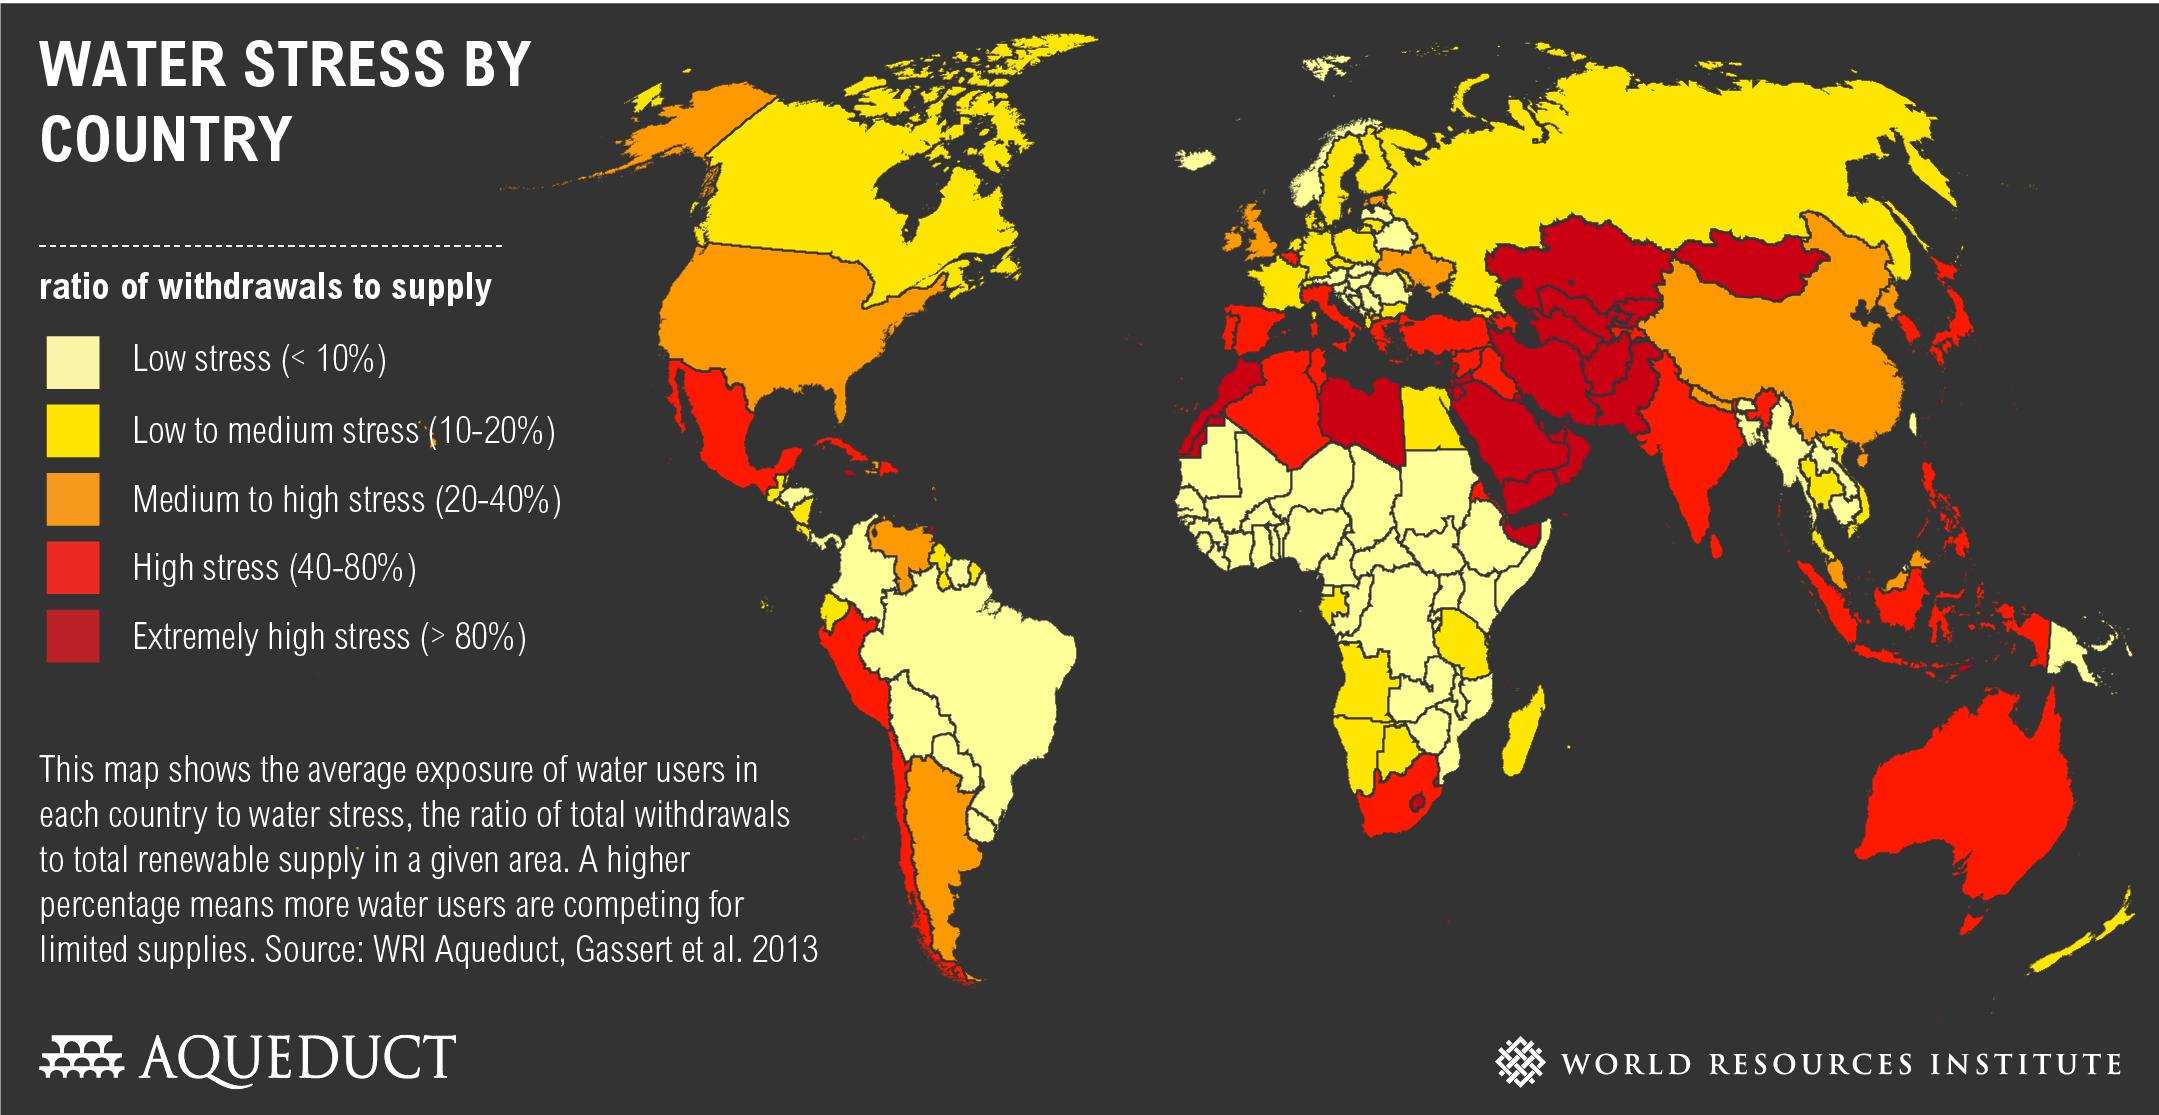 países con mayor estrés hídrico